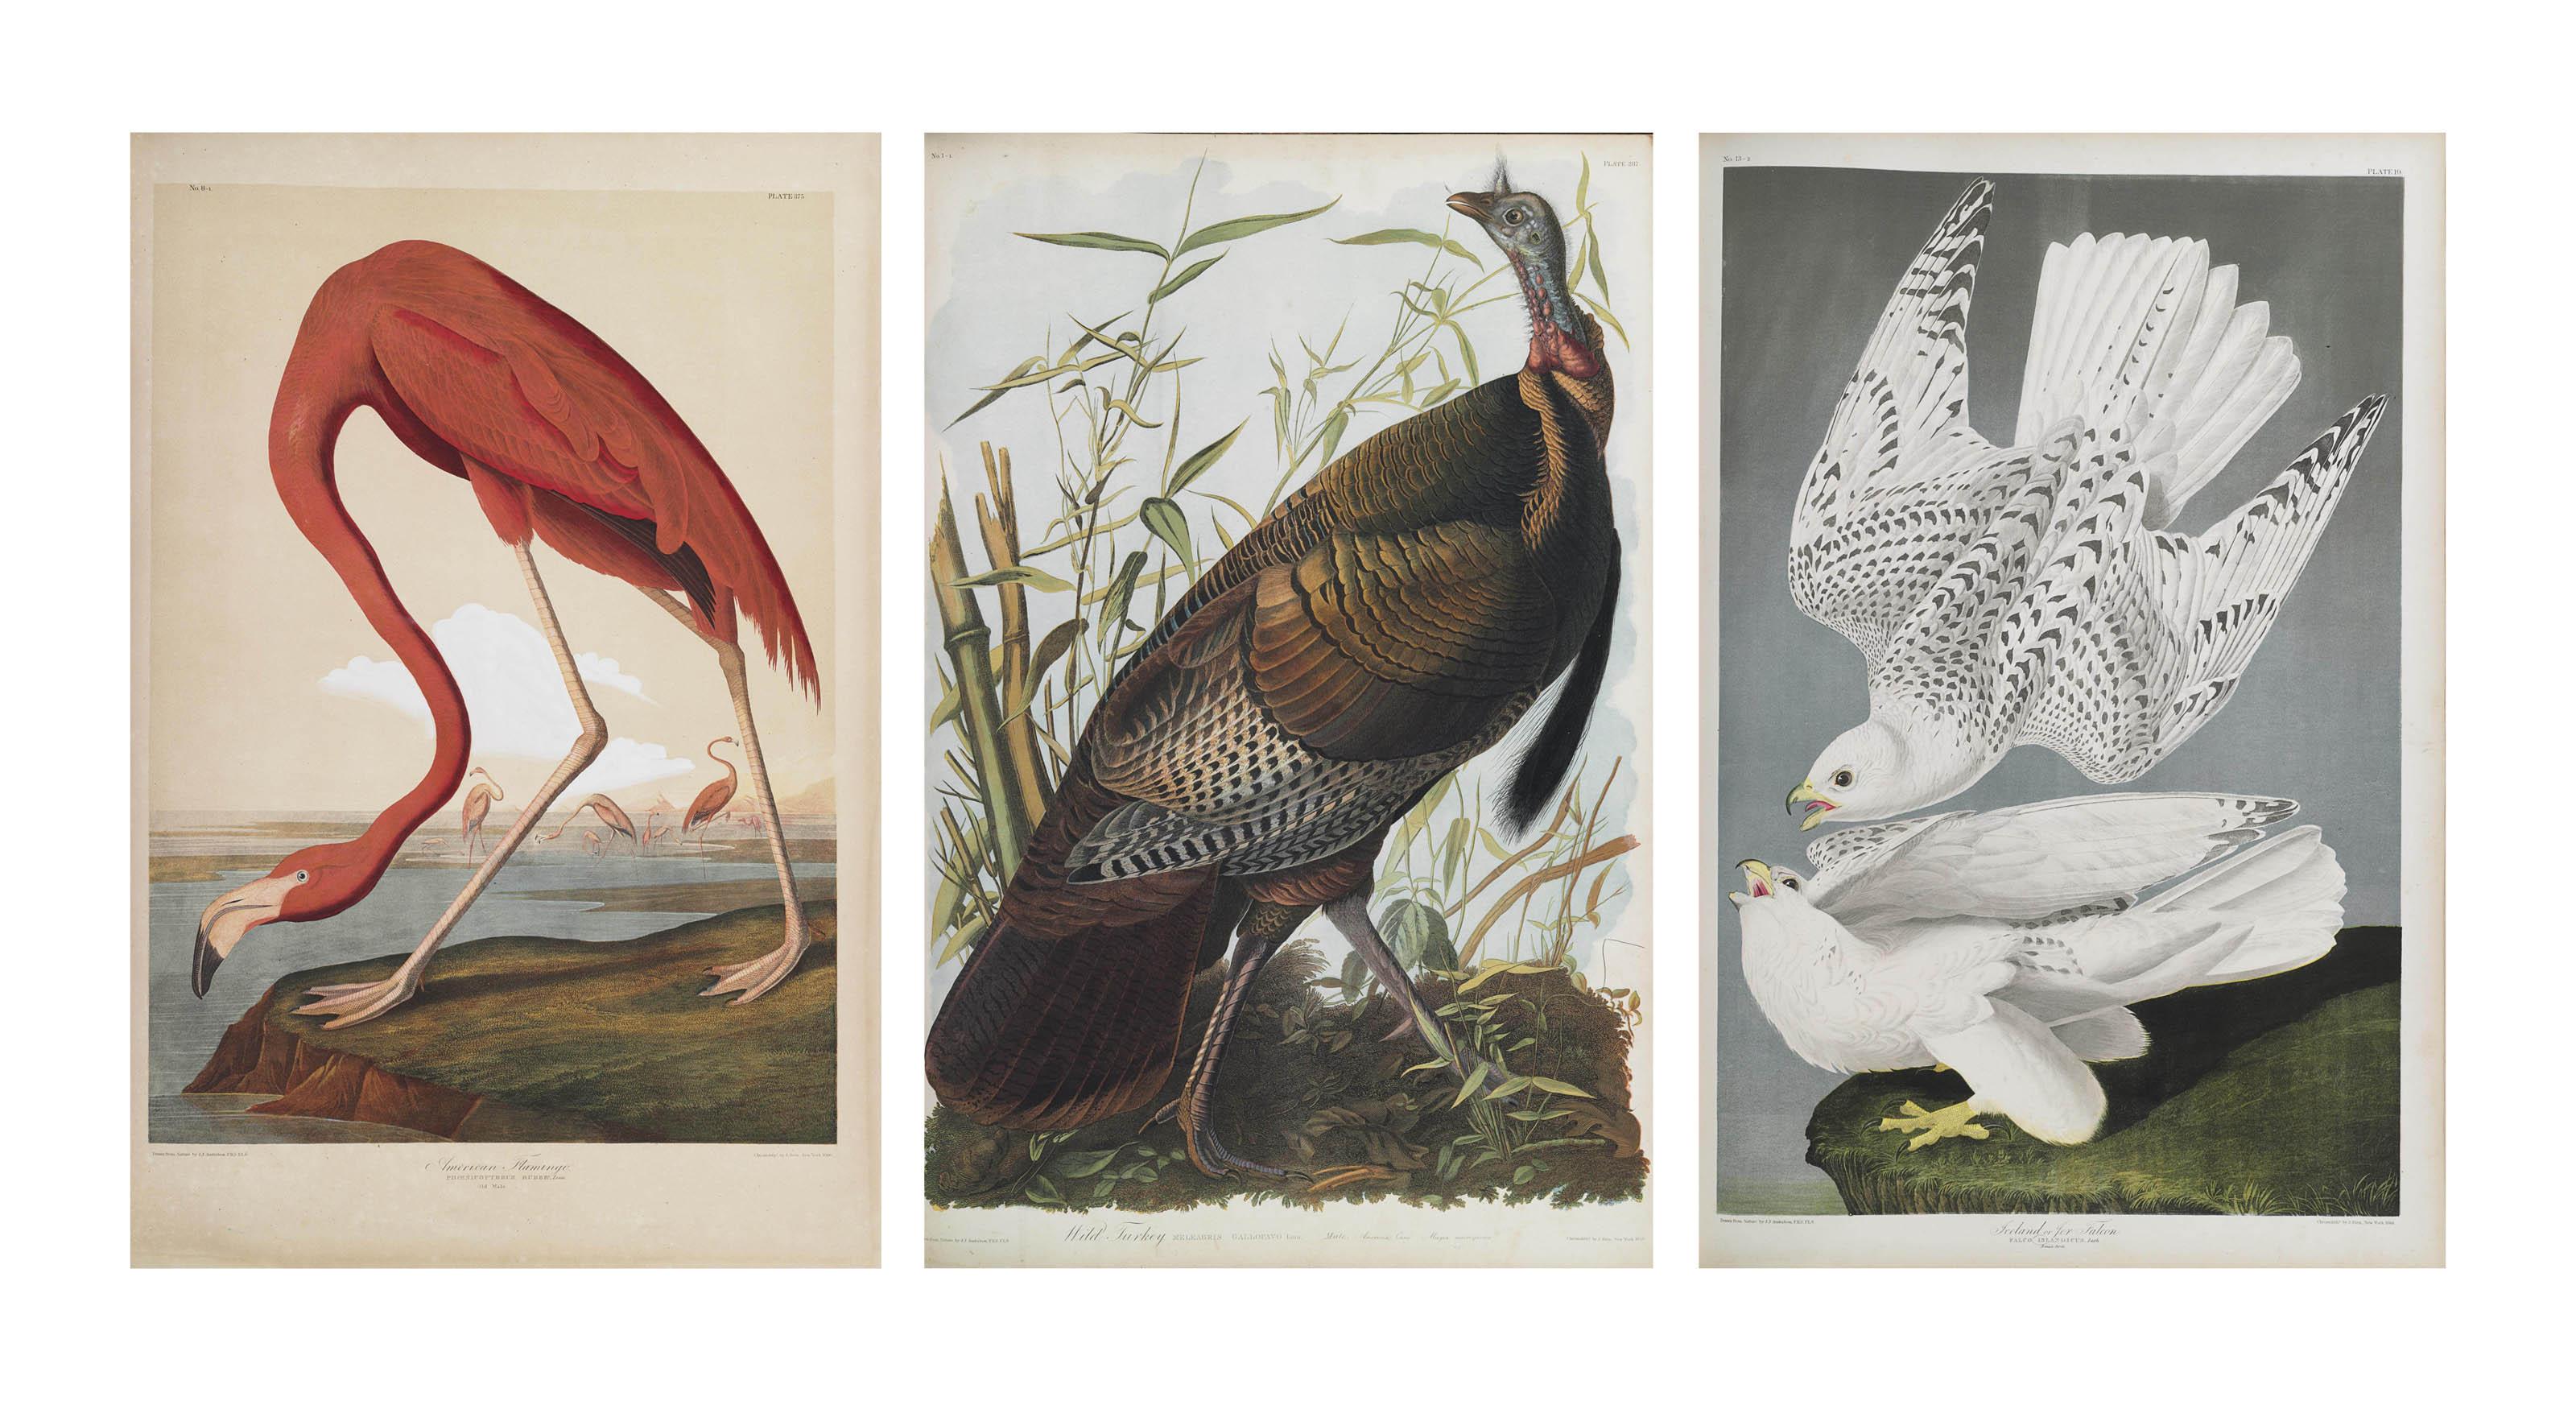 AUDUBON, John James (1785-1851). The Birds of America, from Original Drawings by John James Audubon... Reissued by J[ohn] W[oodhouse] Audubon. New York: Roe Lockwood & Son, 1860.